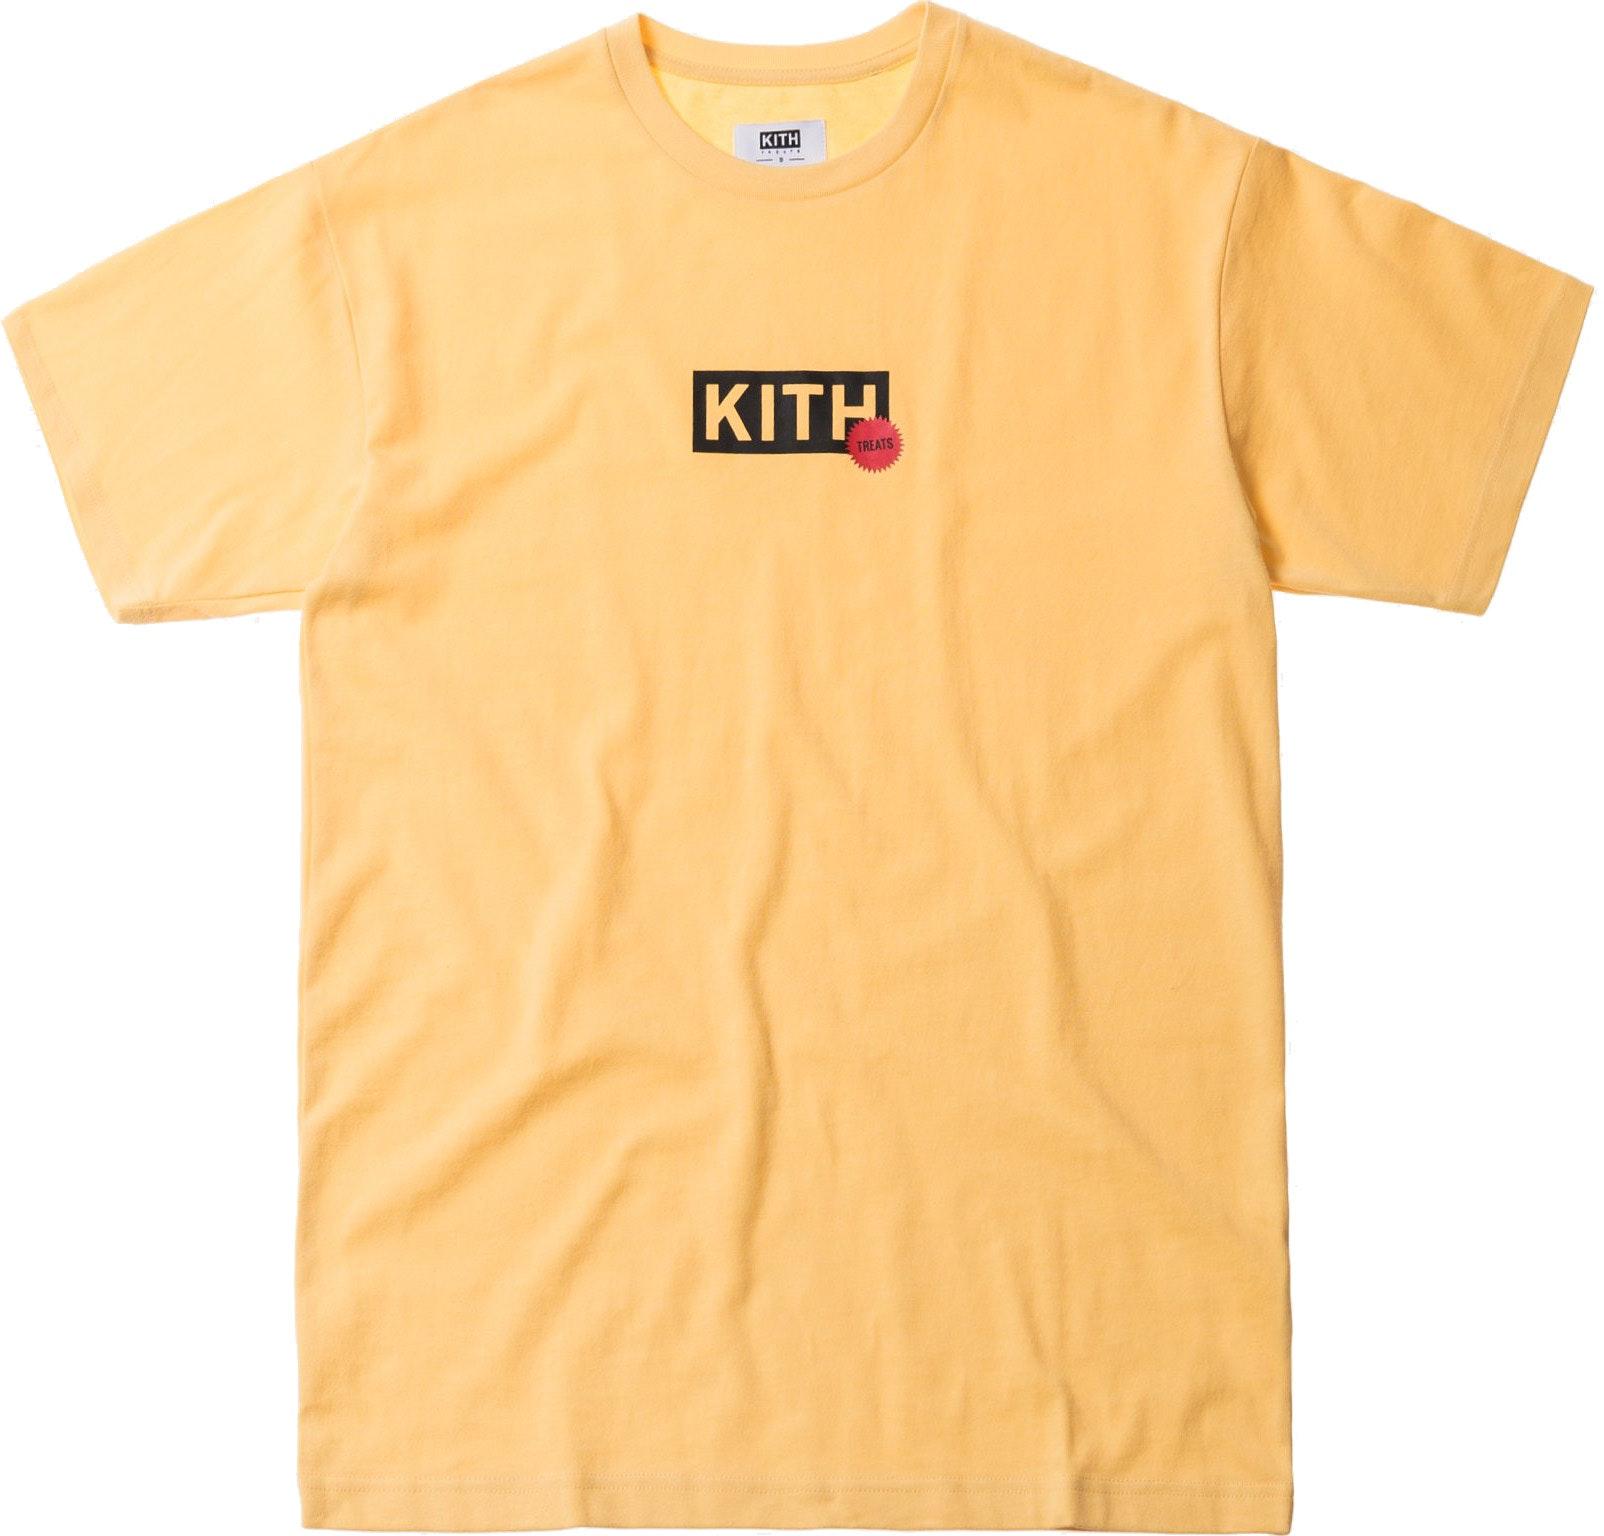 Kith Treats Proof Sticker Tee Yellow